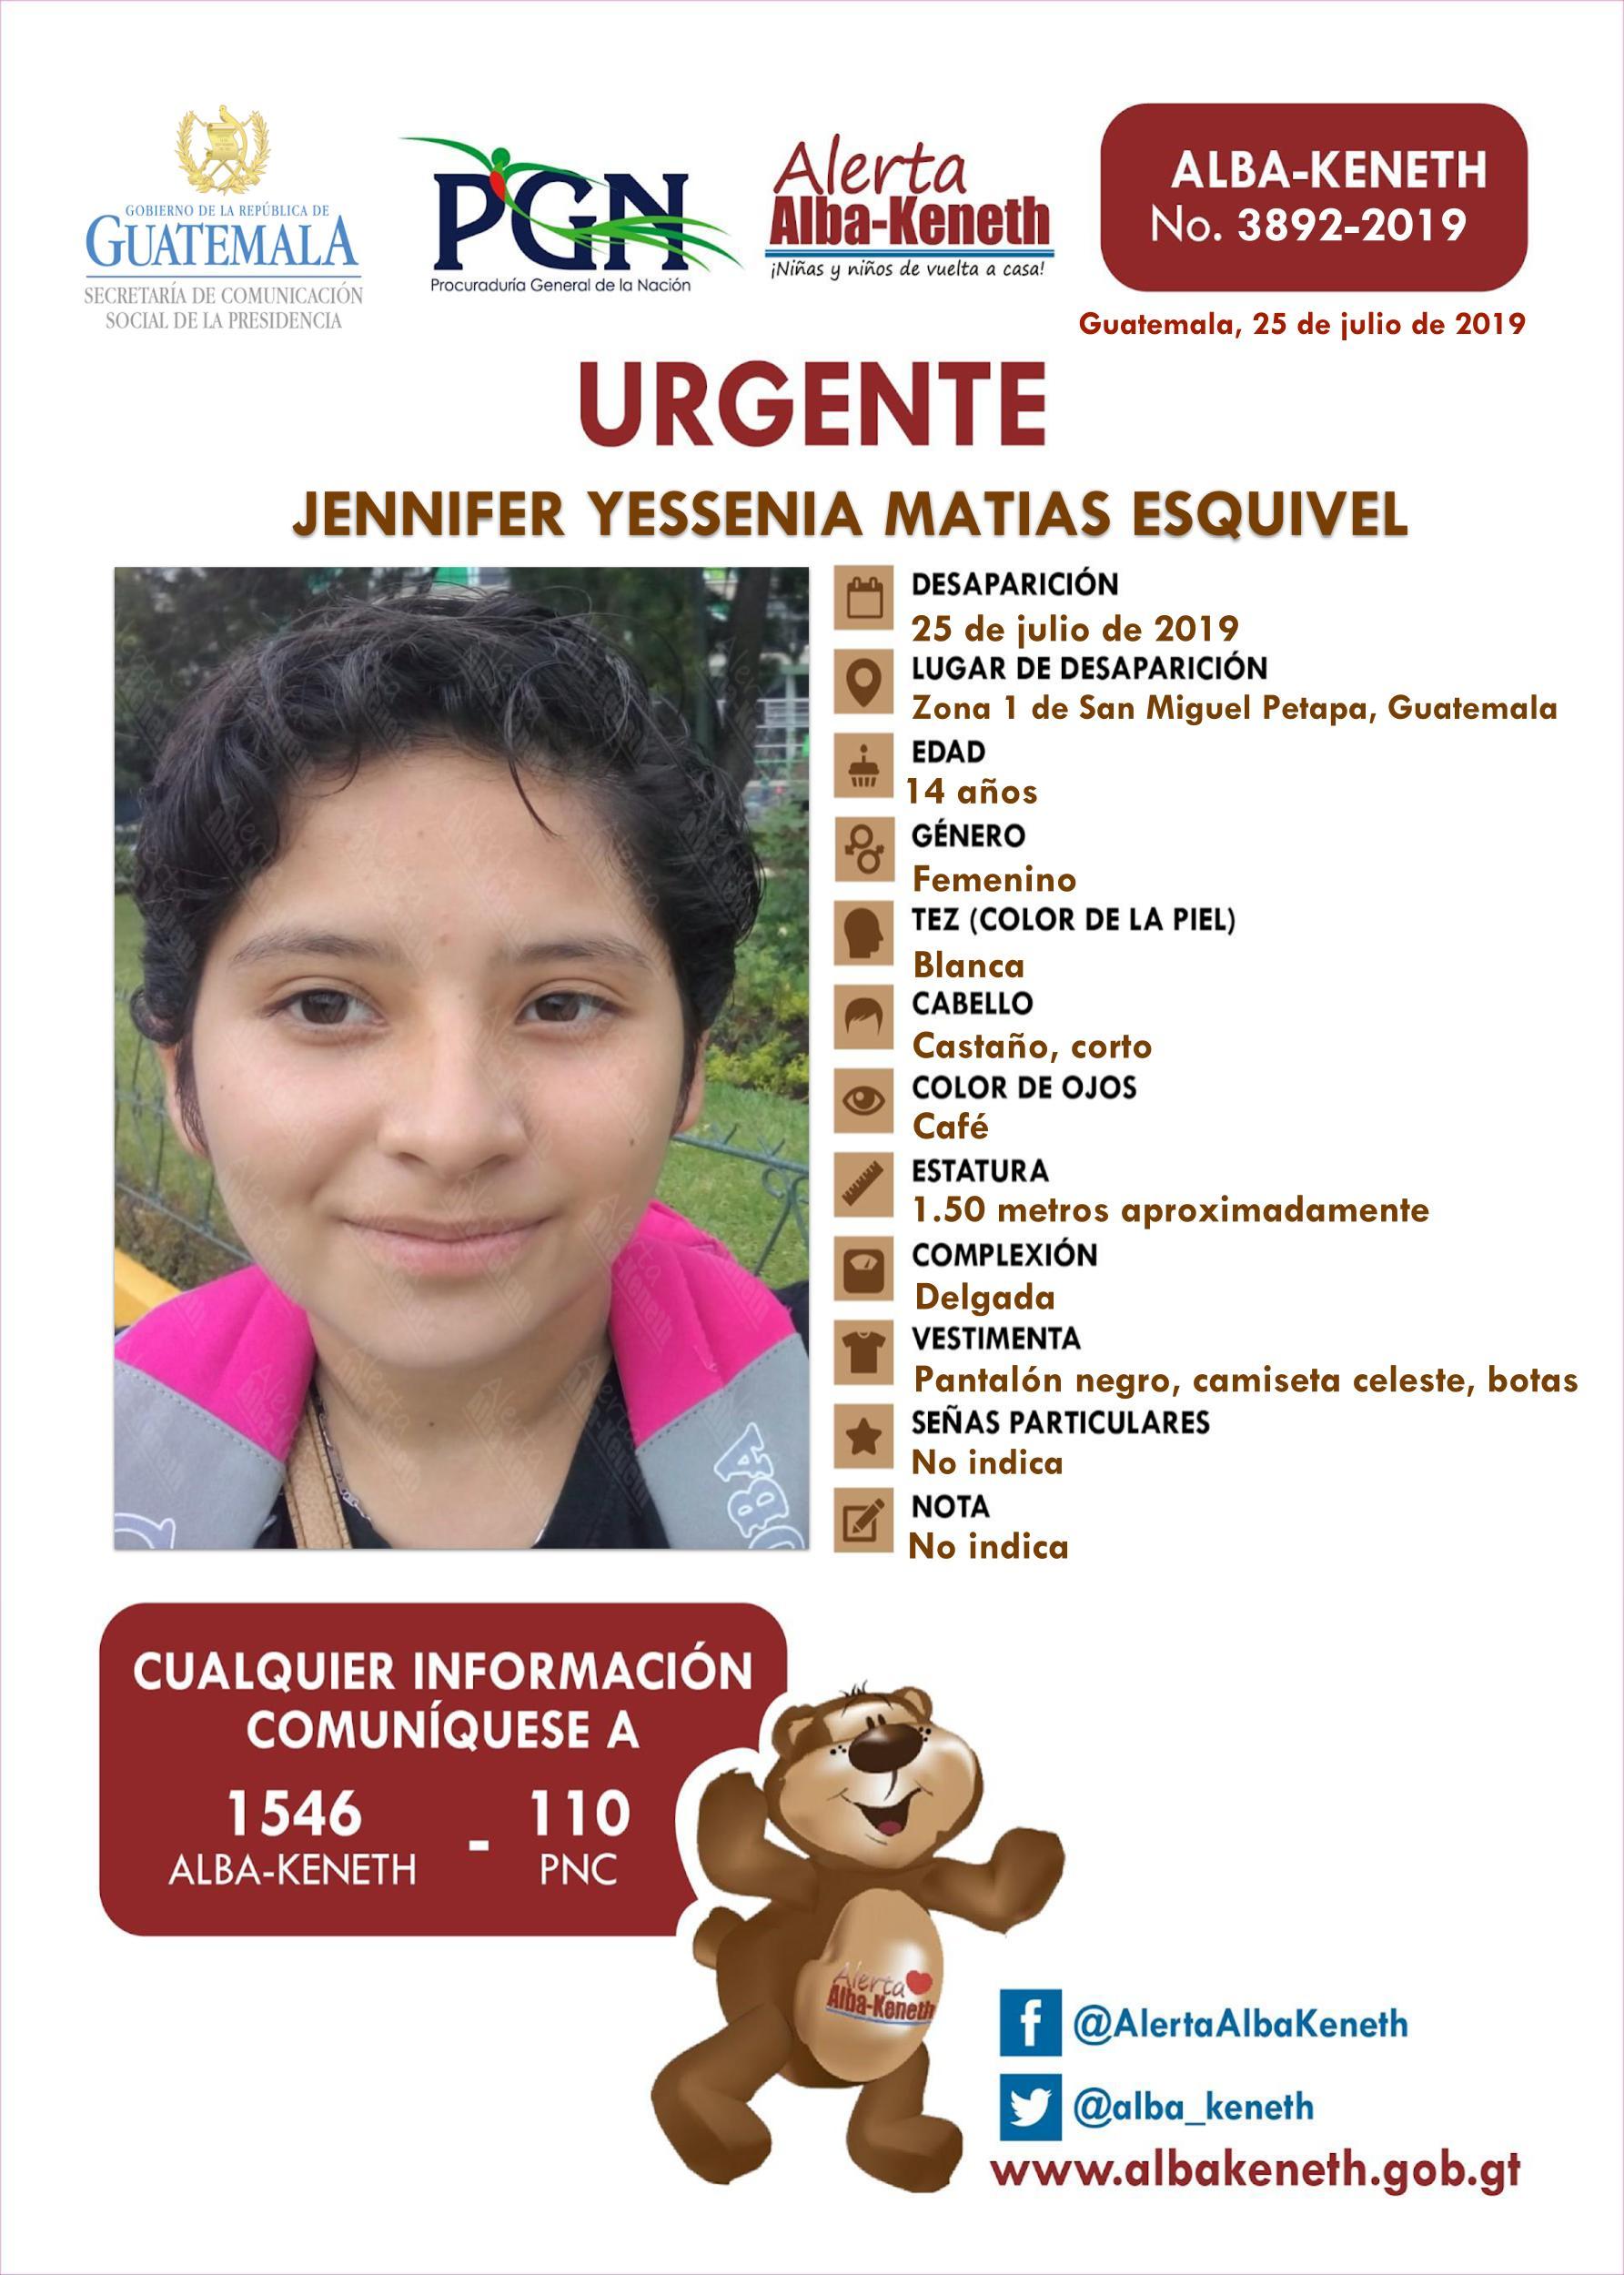 Jennifer Yessenia Matias Esquivel